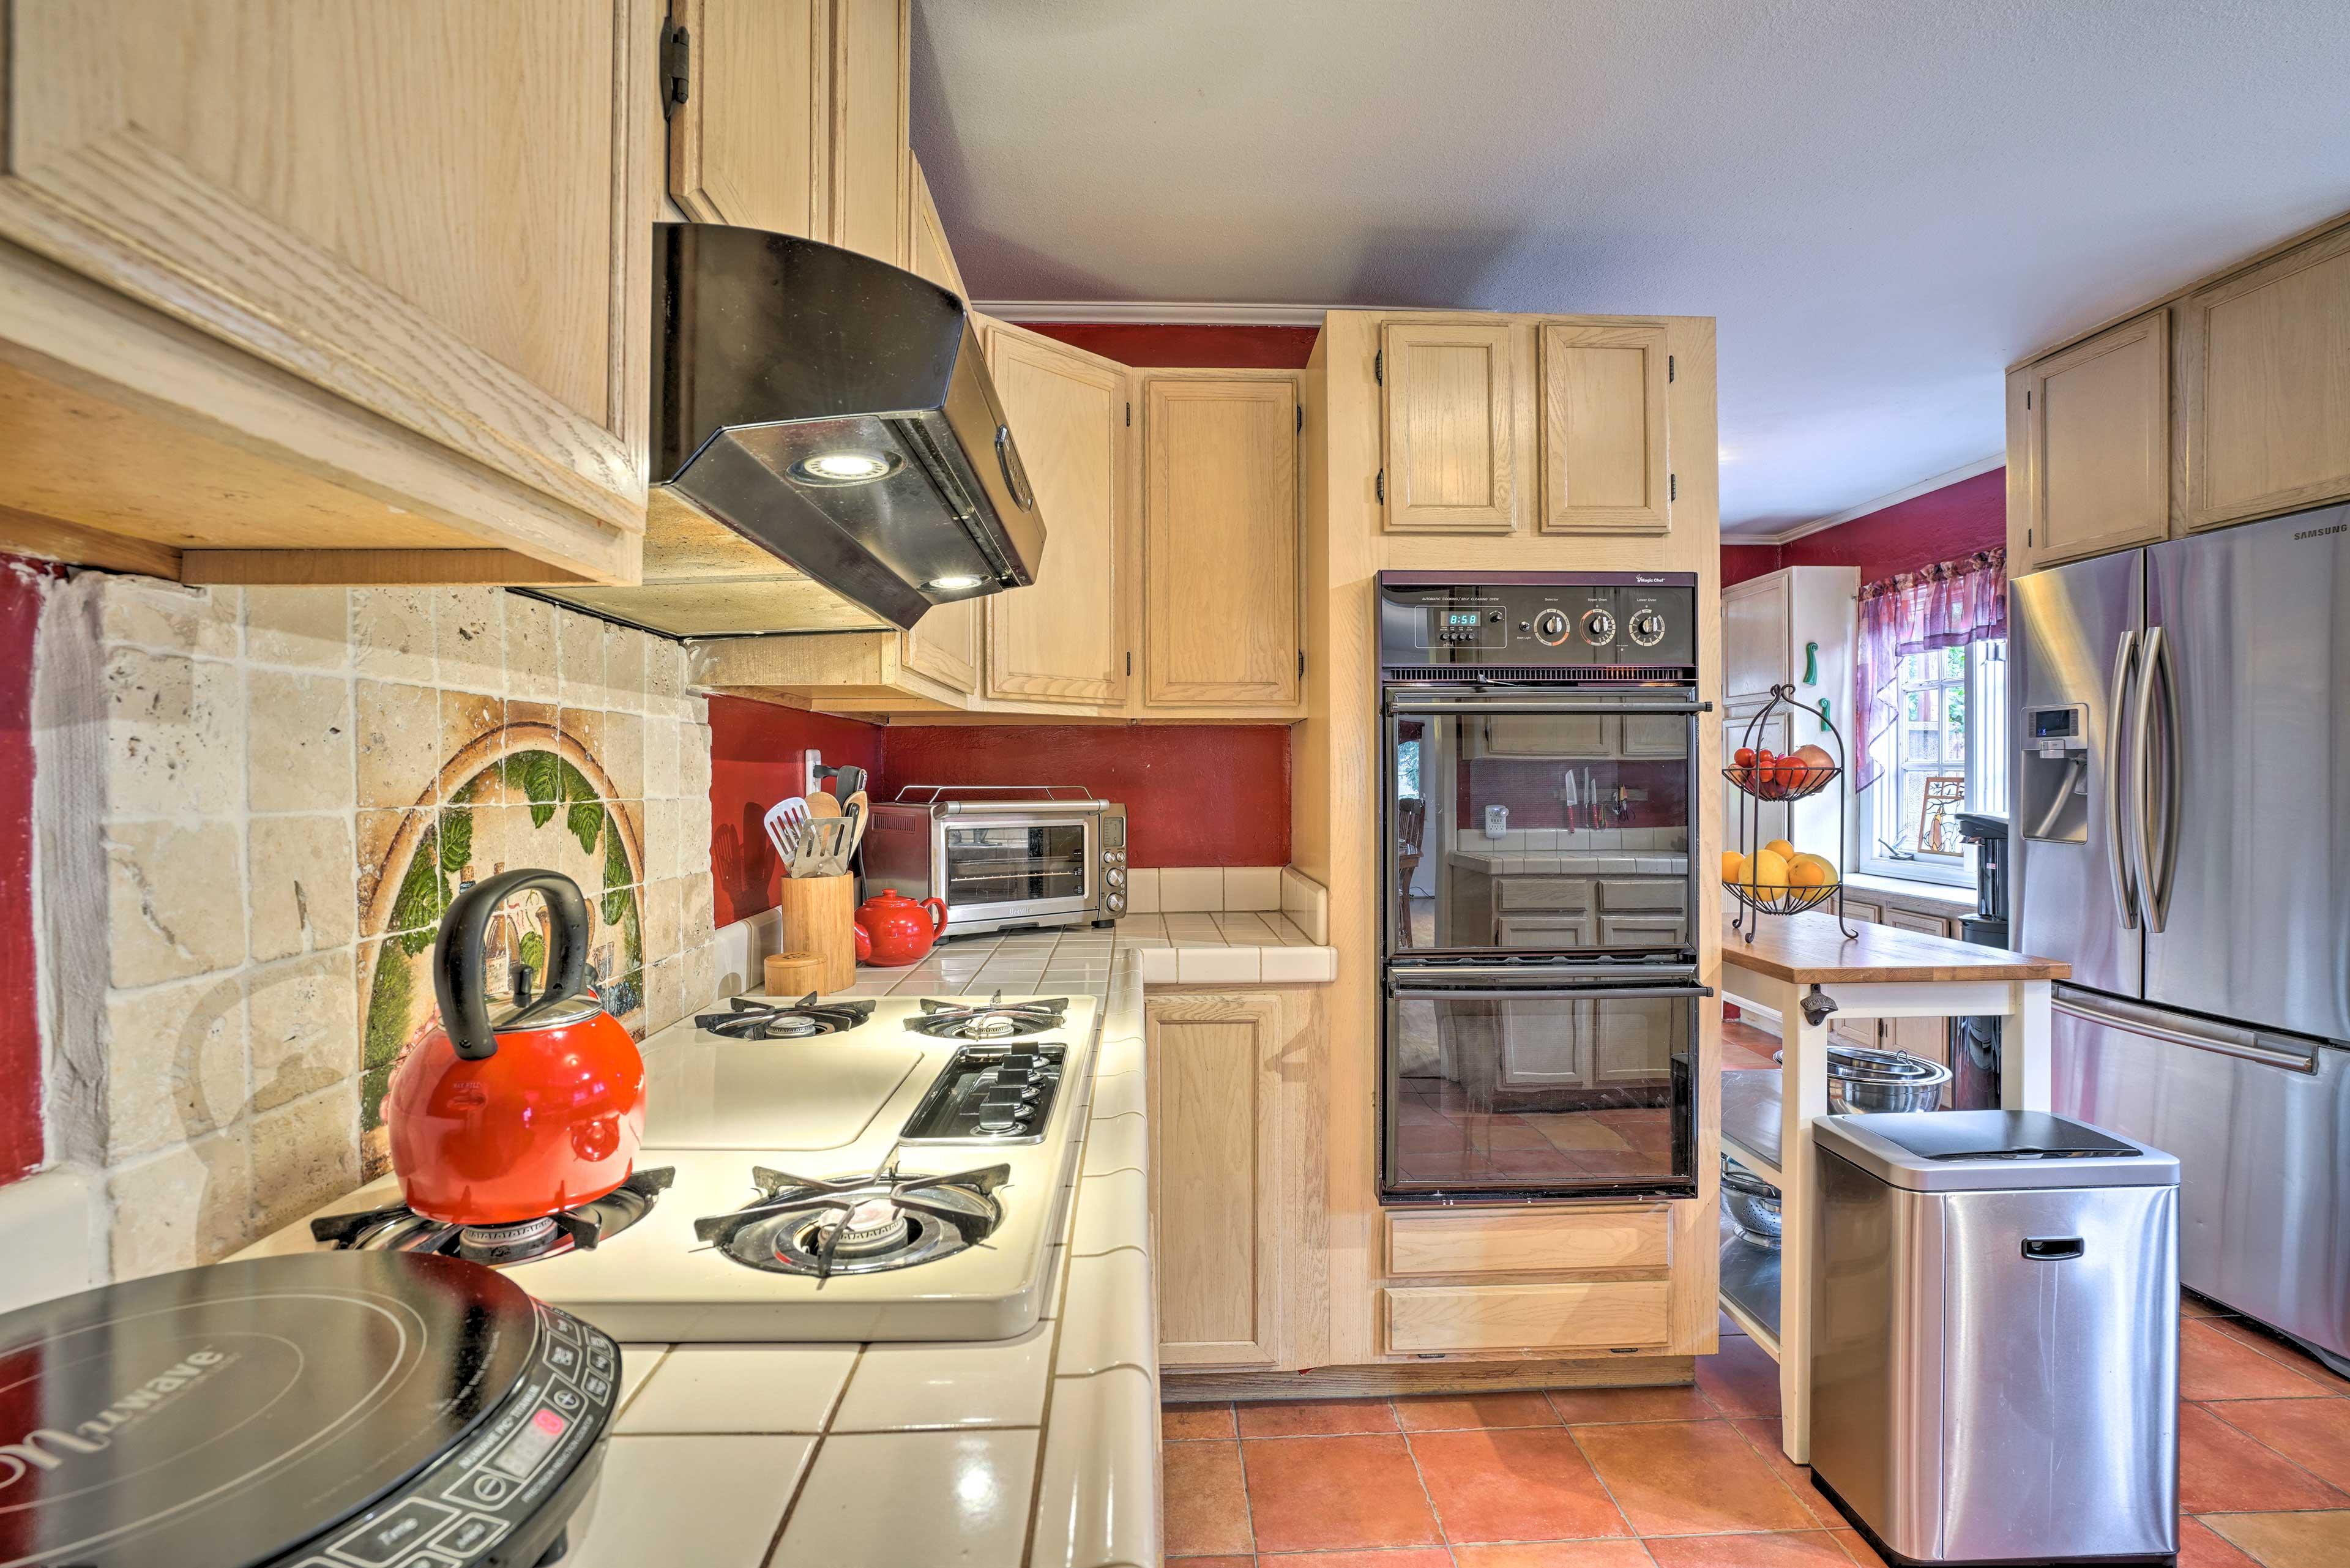 The tile backsplash adds a unique charm to the kitchen.